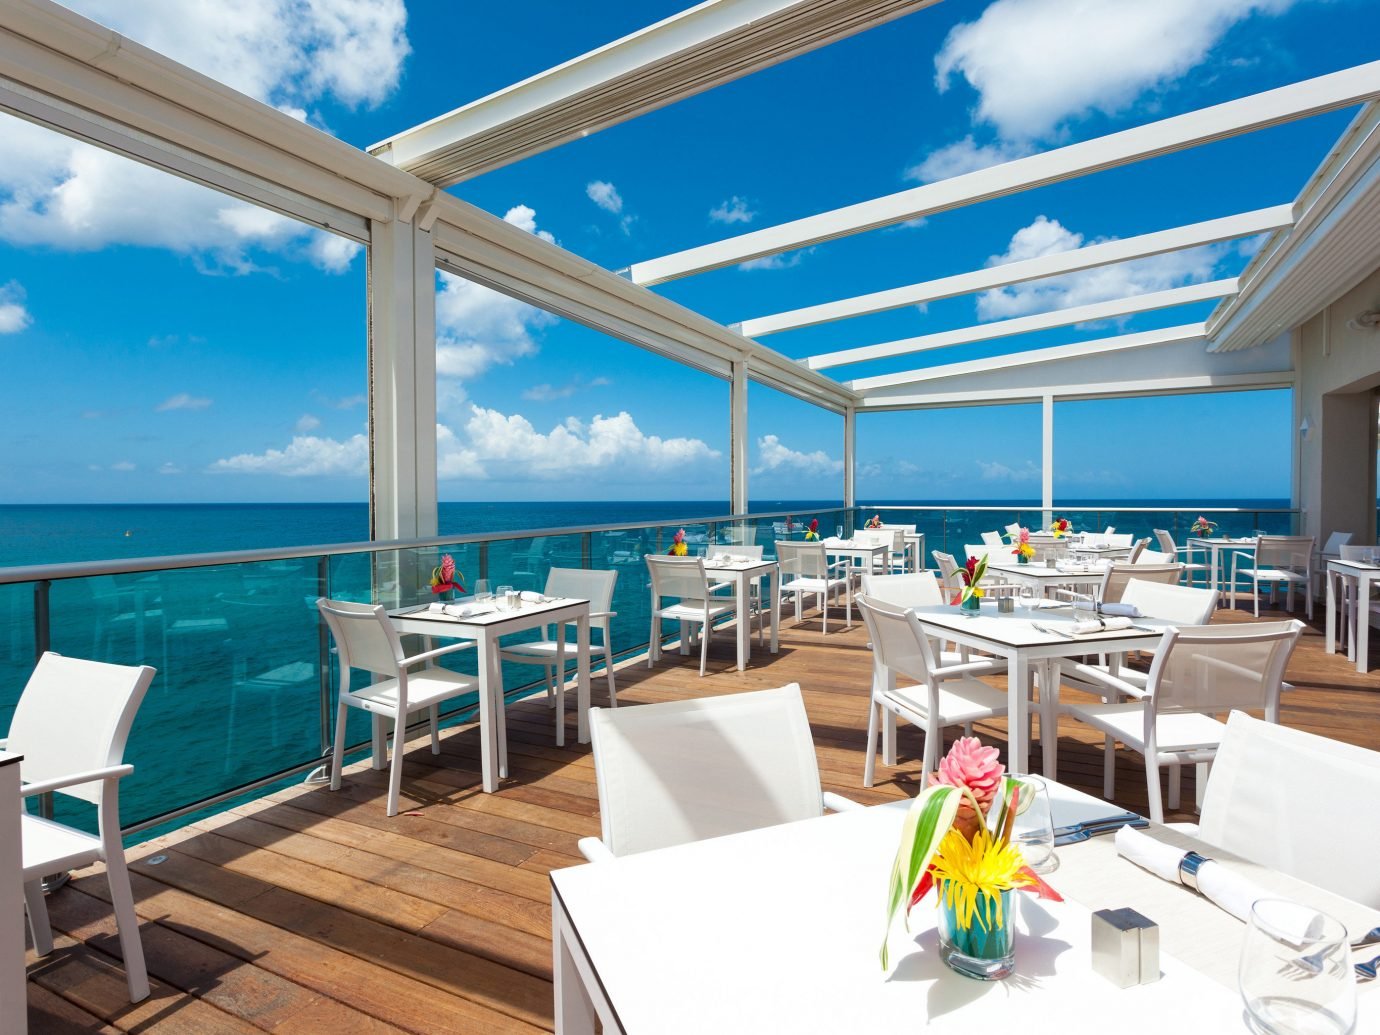 Trip Ideas sky chair passenger ship leisure Boat caribbean yacht Resort ceiling vacation vehicle restaurant ship estate real estate watercraft Deck overlooking